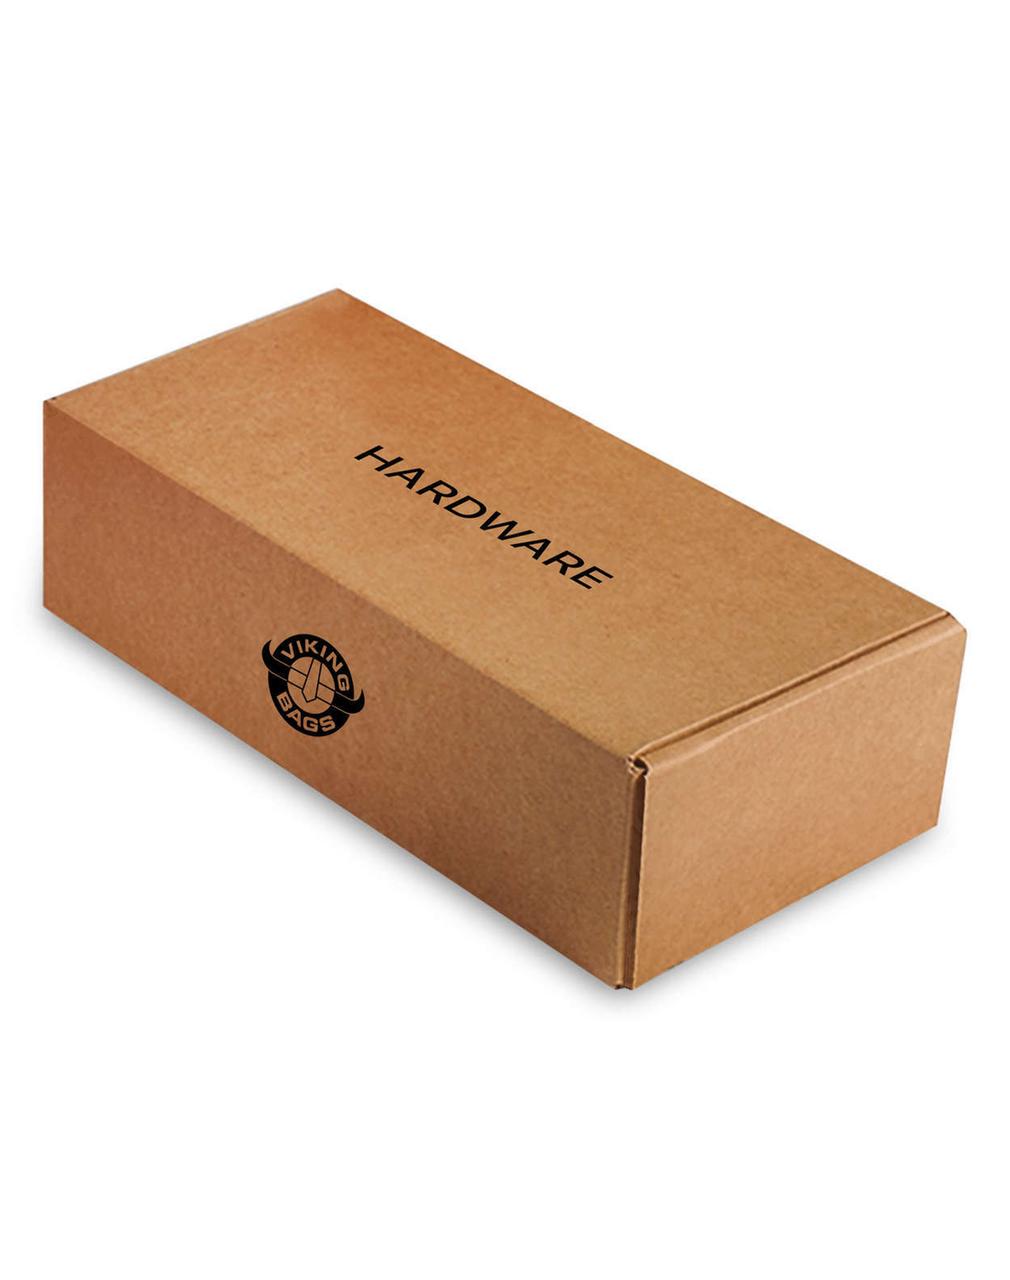 Yamaha V Star 950 Small Thor Series Motorcycle Saddlebags Hardware Box